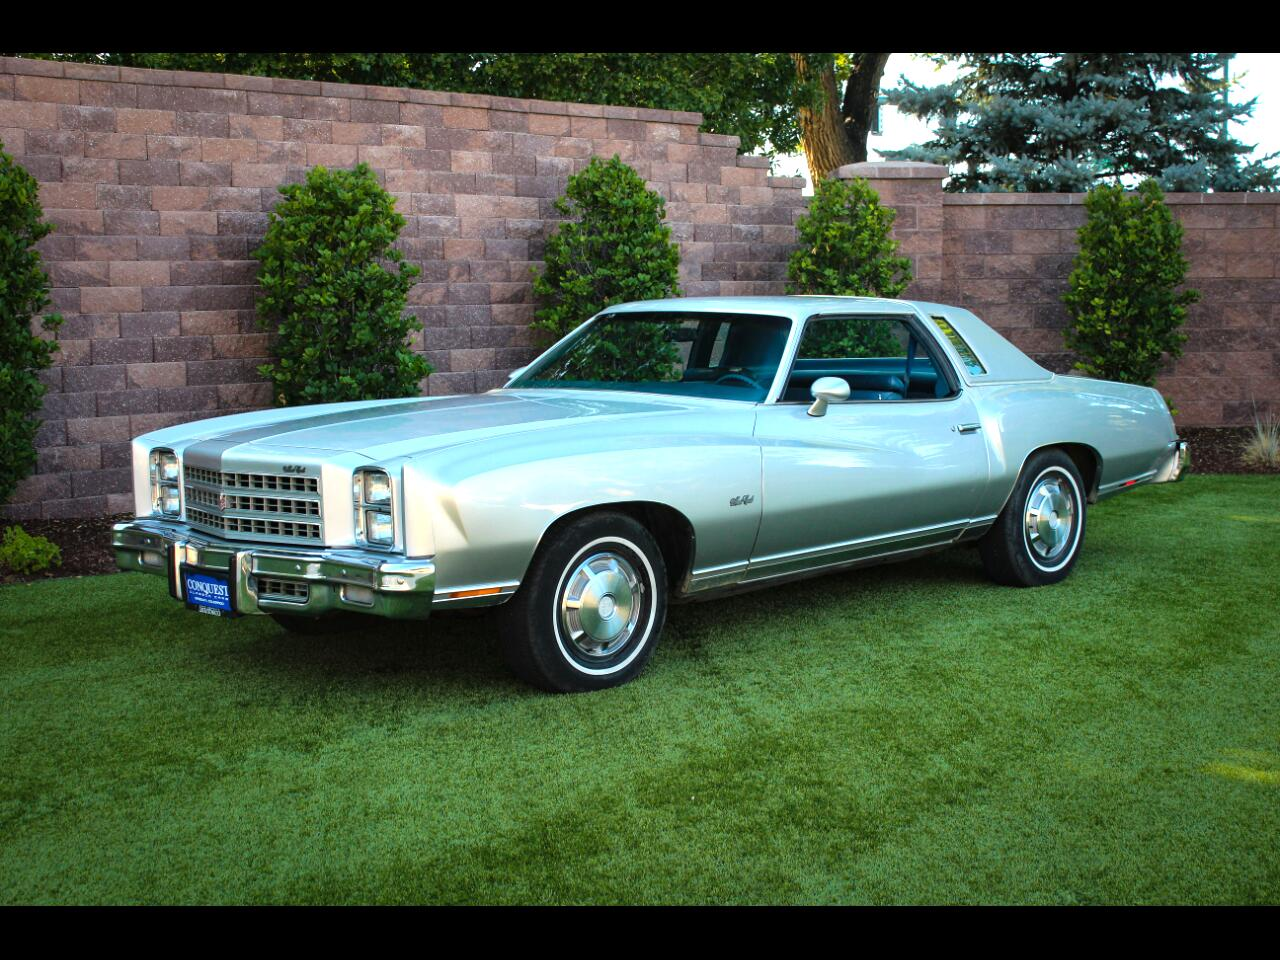 Chevrolet Monte Carlo Landau 1976